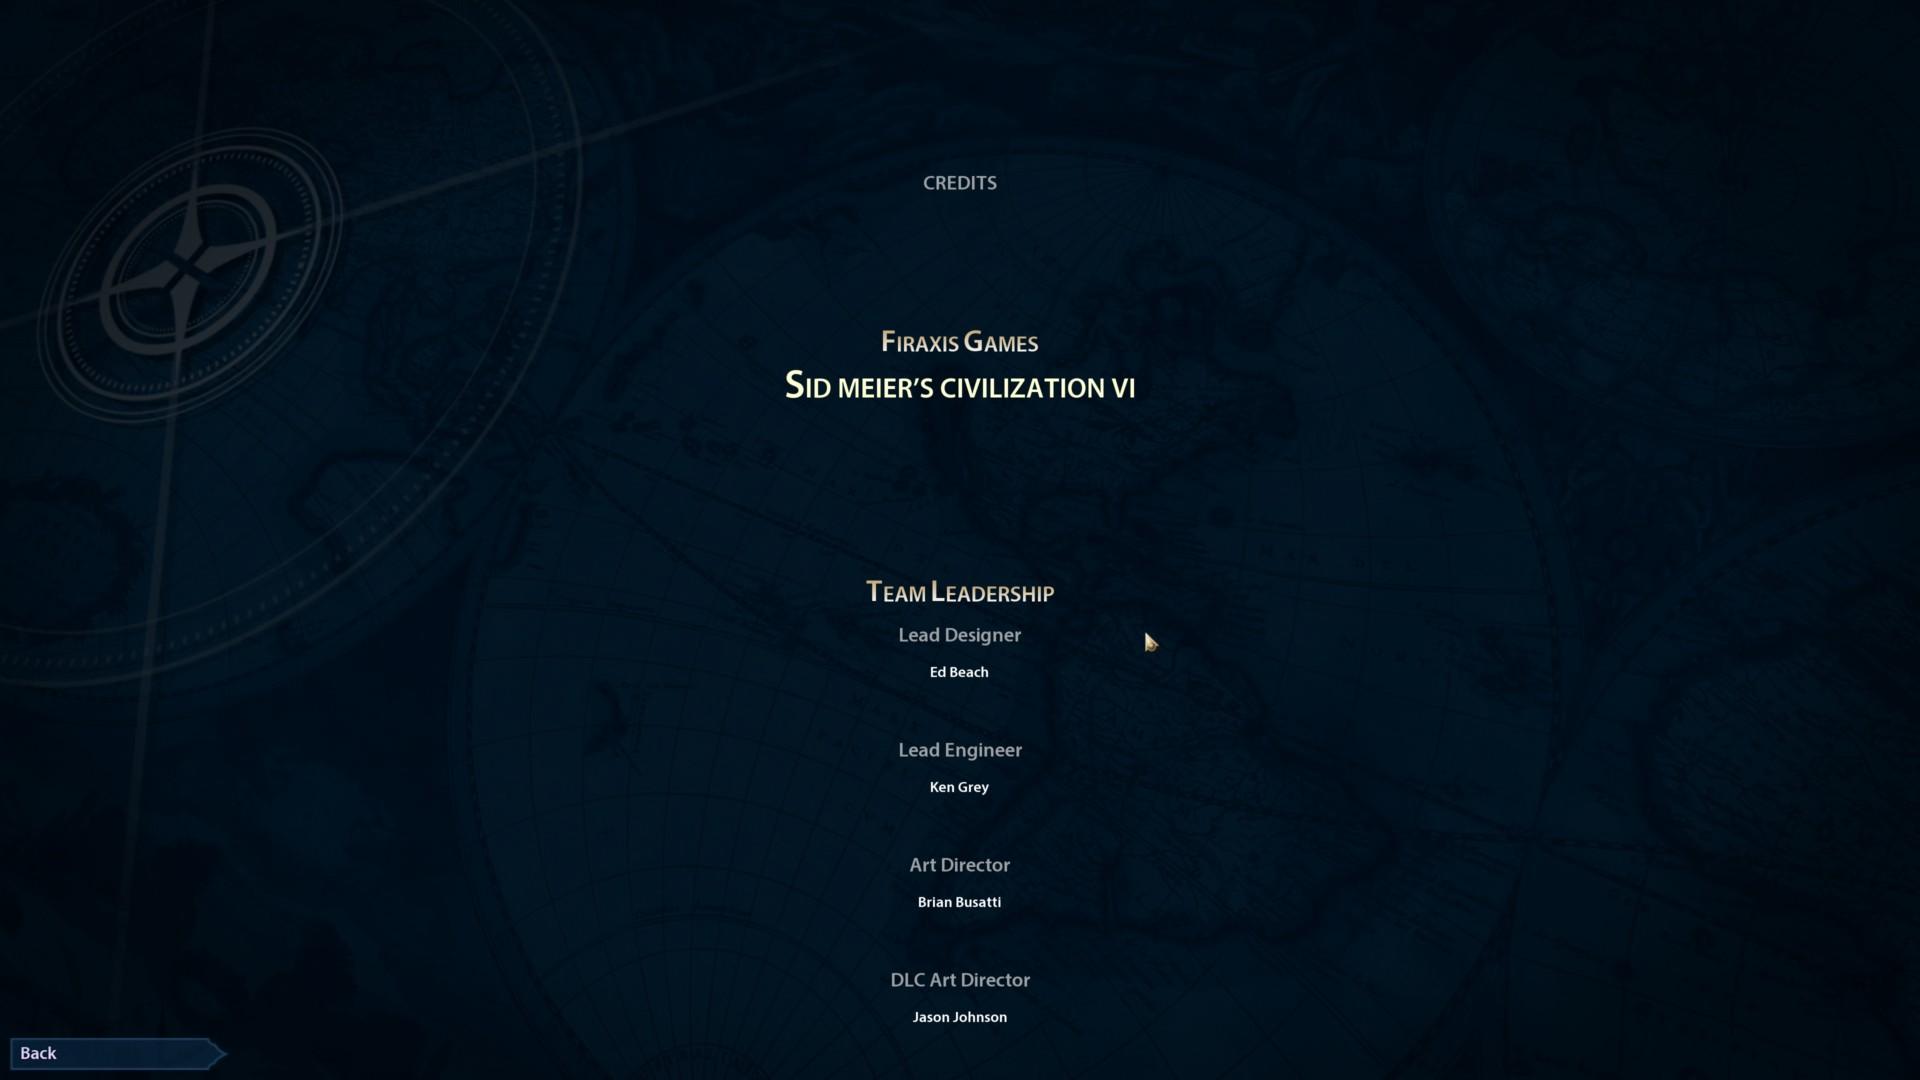 sid-meiers-civilization-vi-credits